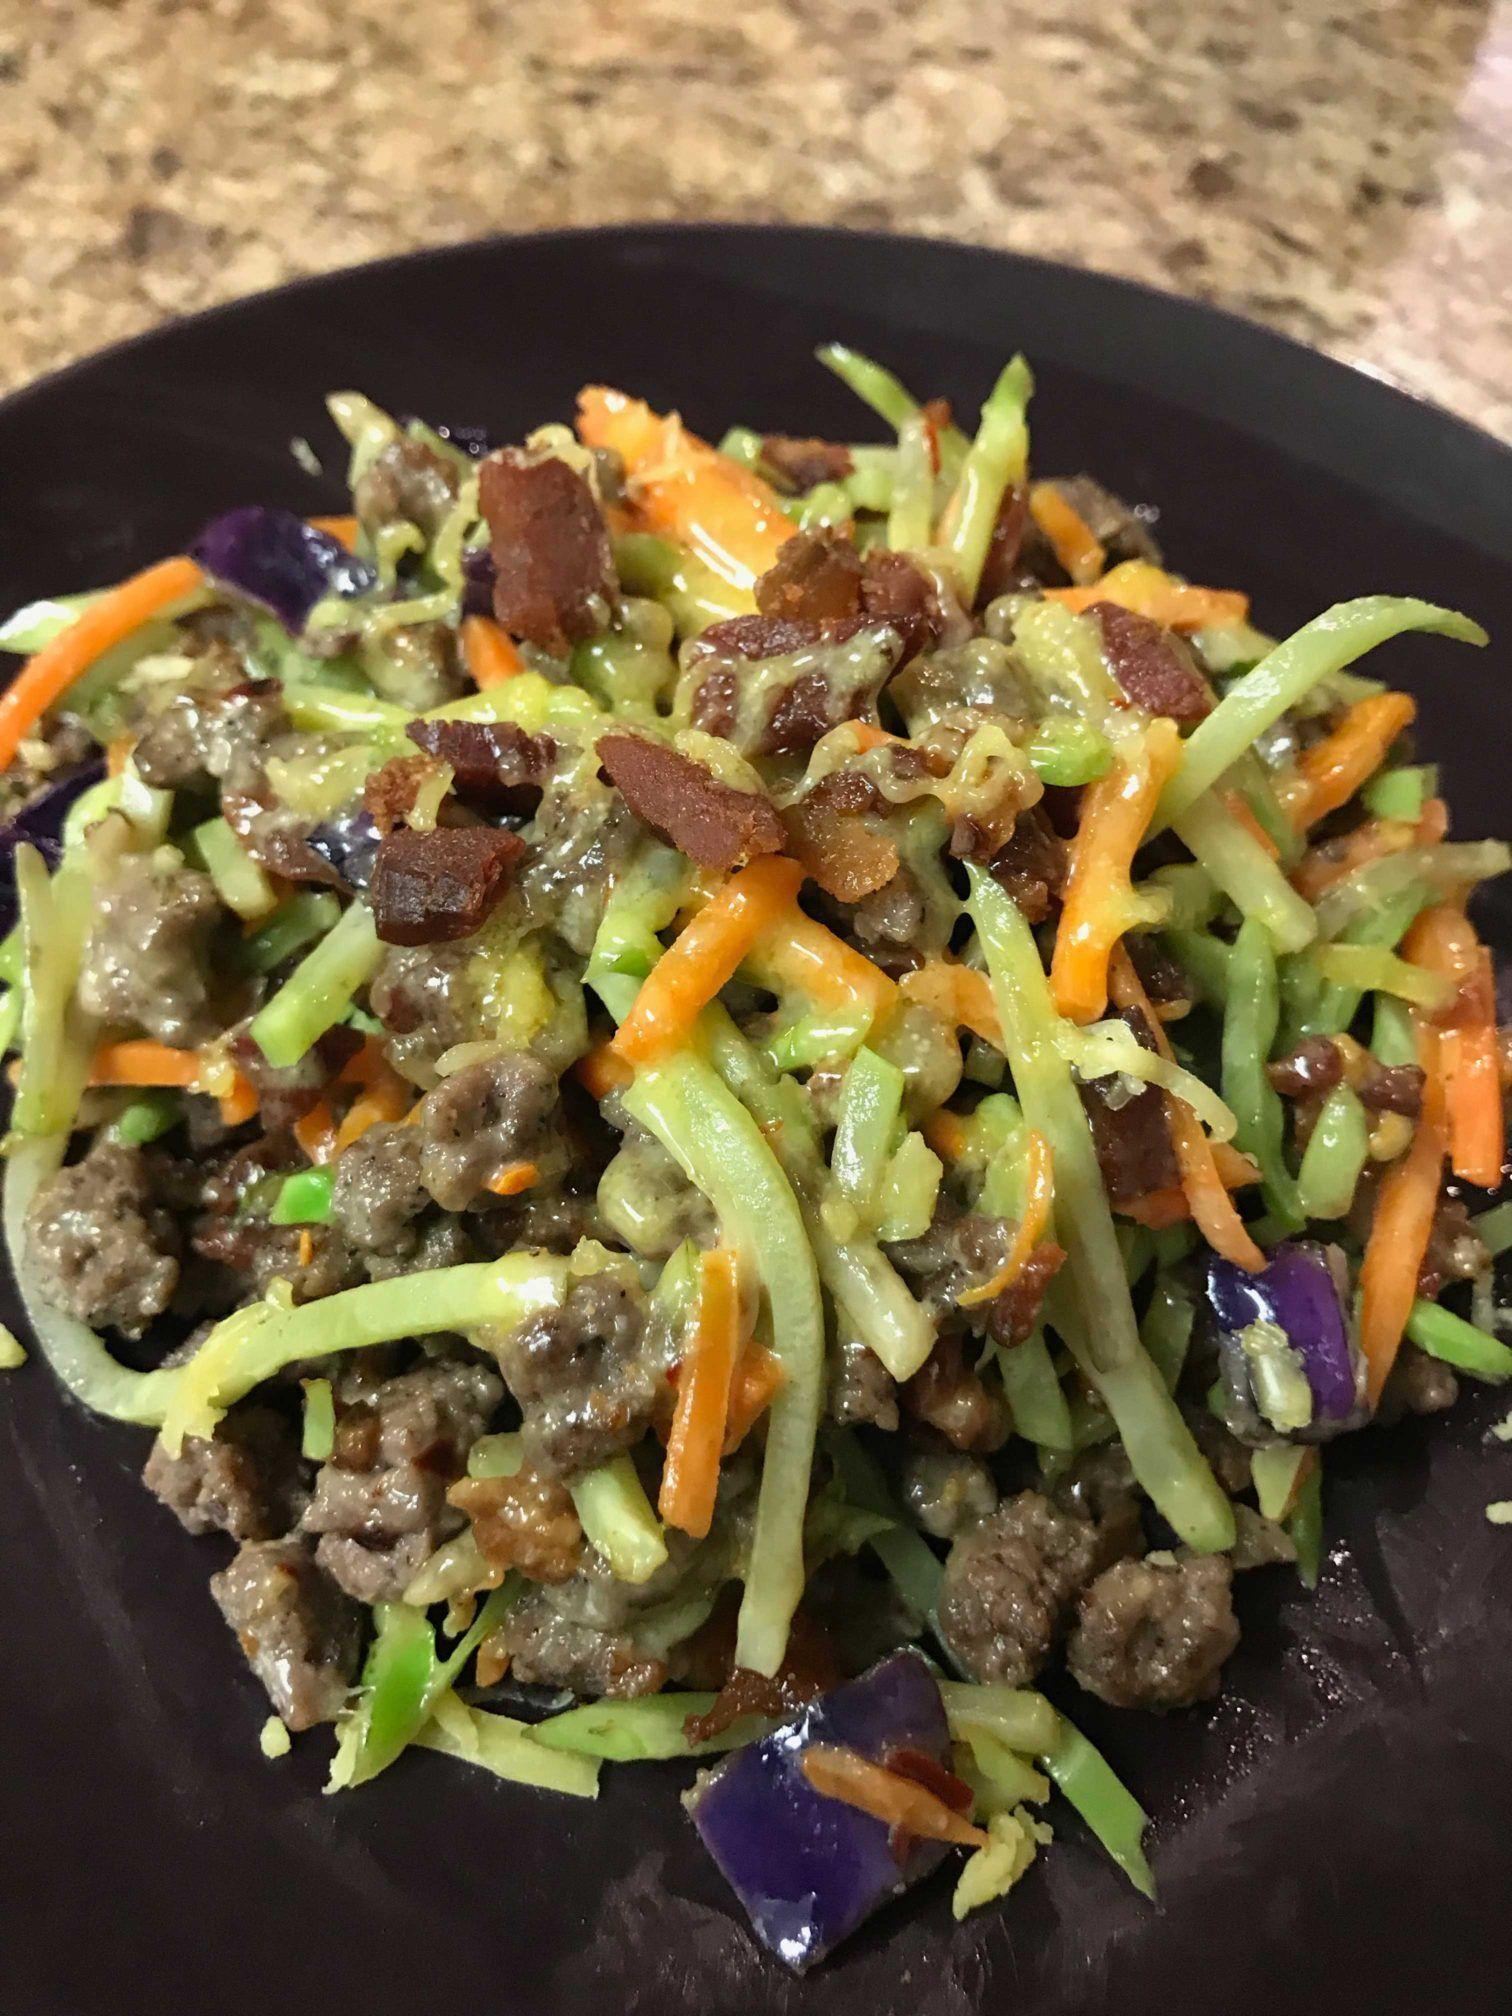 Keto Bacon Cheeseburger Broccoli Slaw Easy Keto Recipes Recipe Broccoli Slaw Recipes Broccoli Slaw Keto Recipes Easy